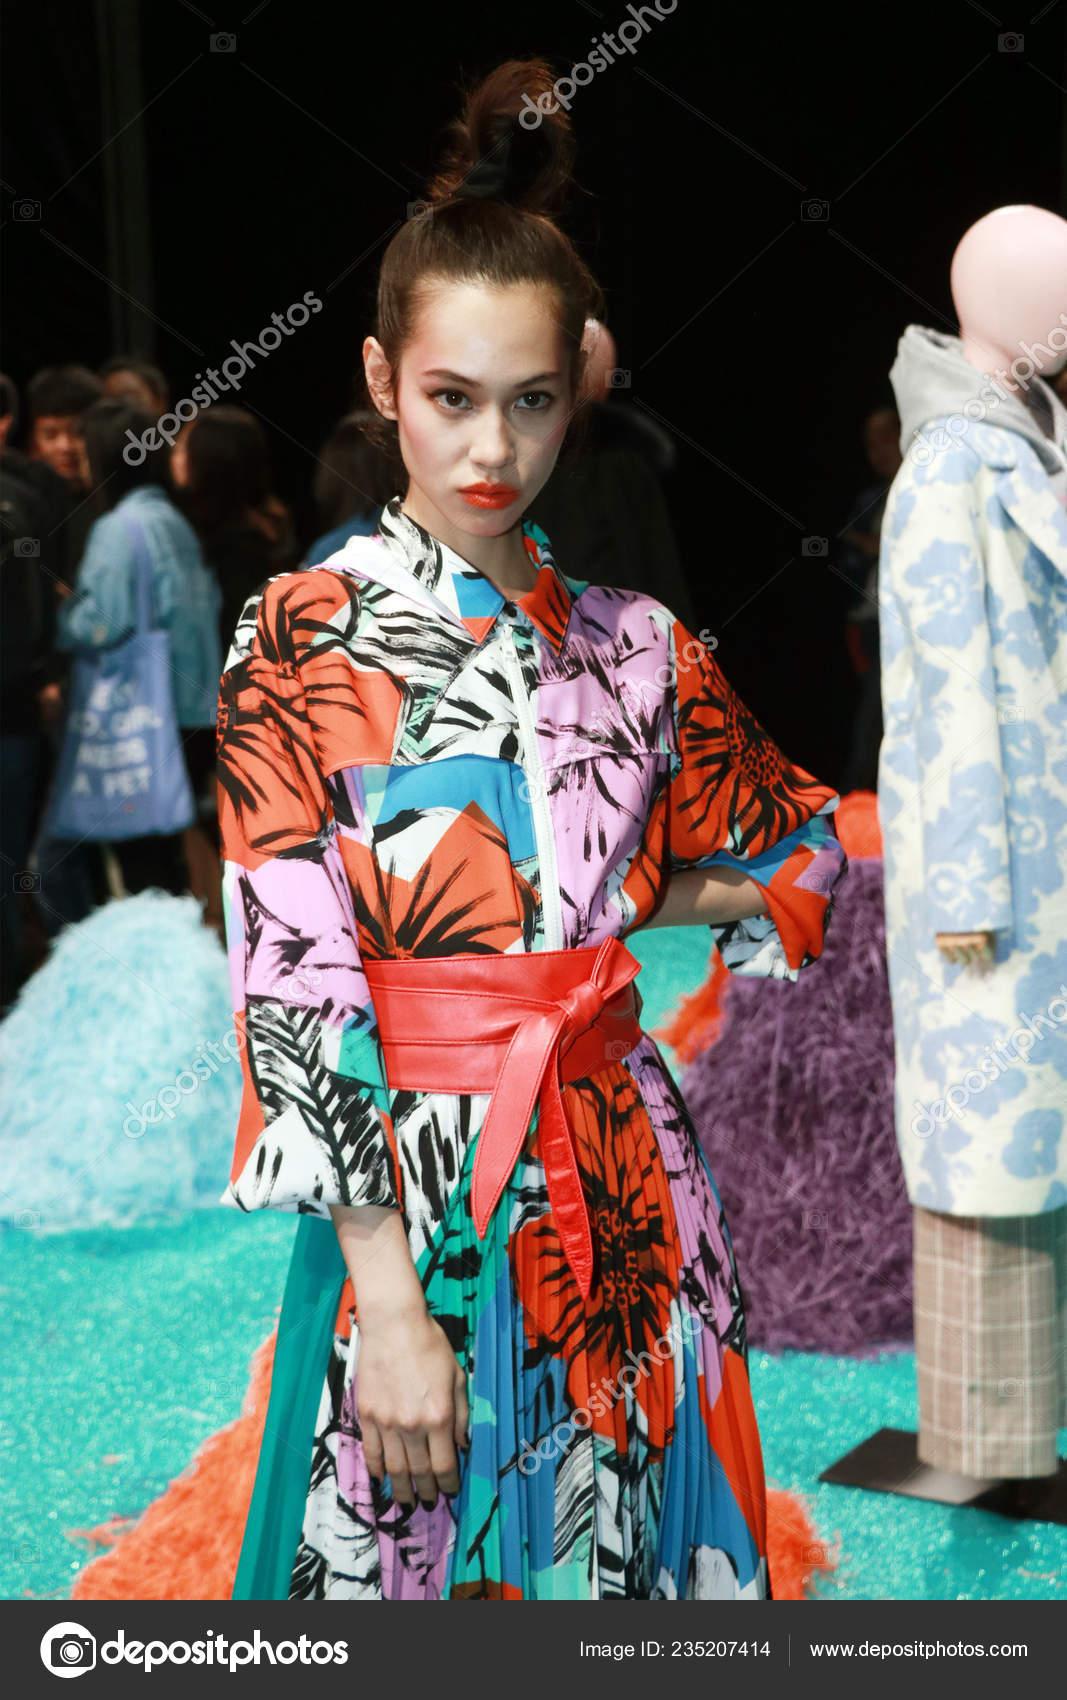 Japanese Model Actress Kiko Mizuhara Poses Fashion Show